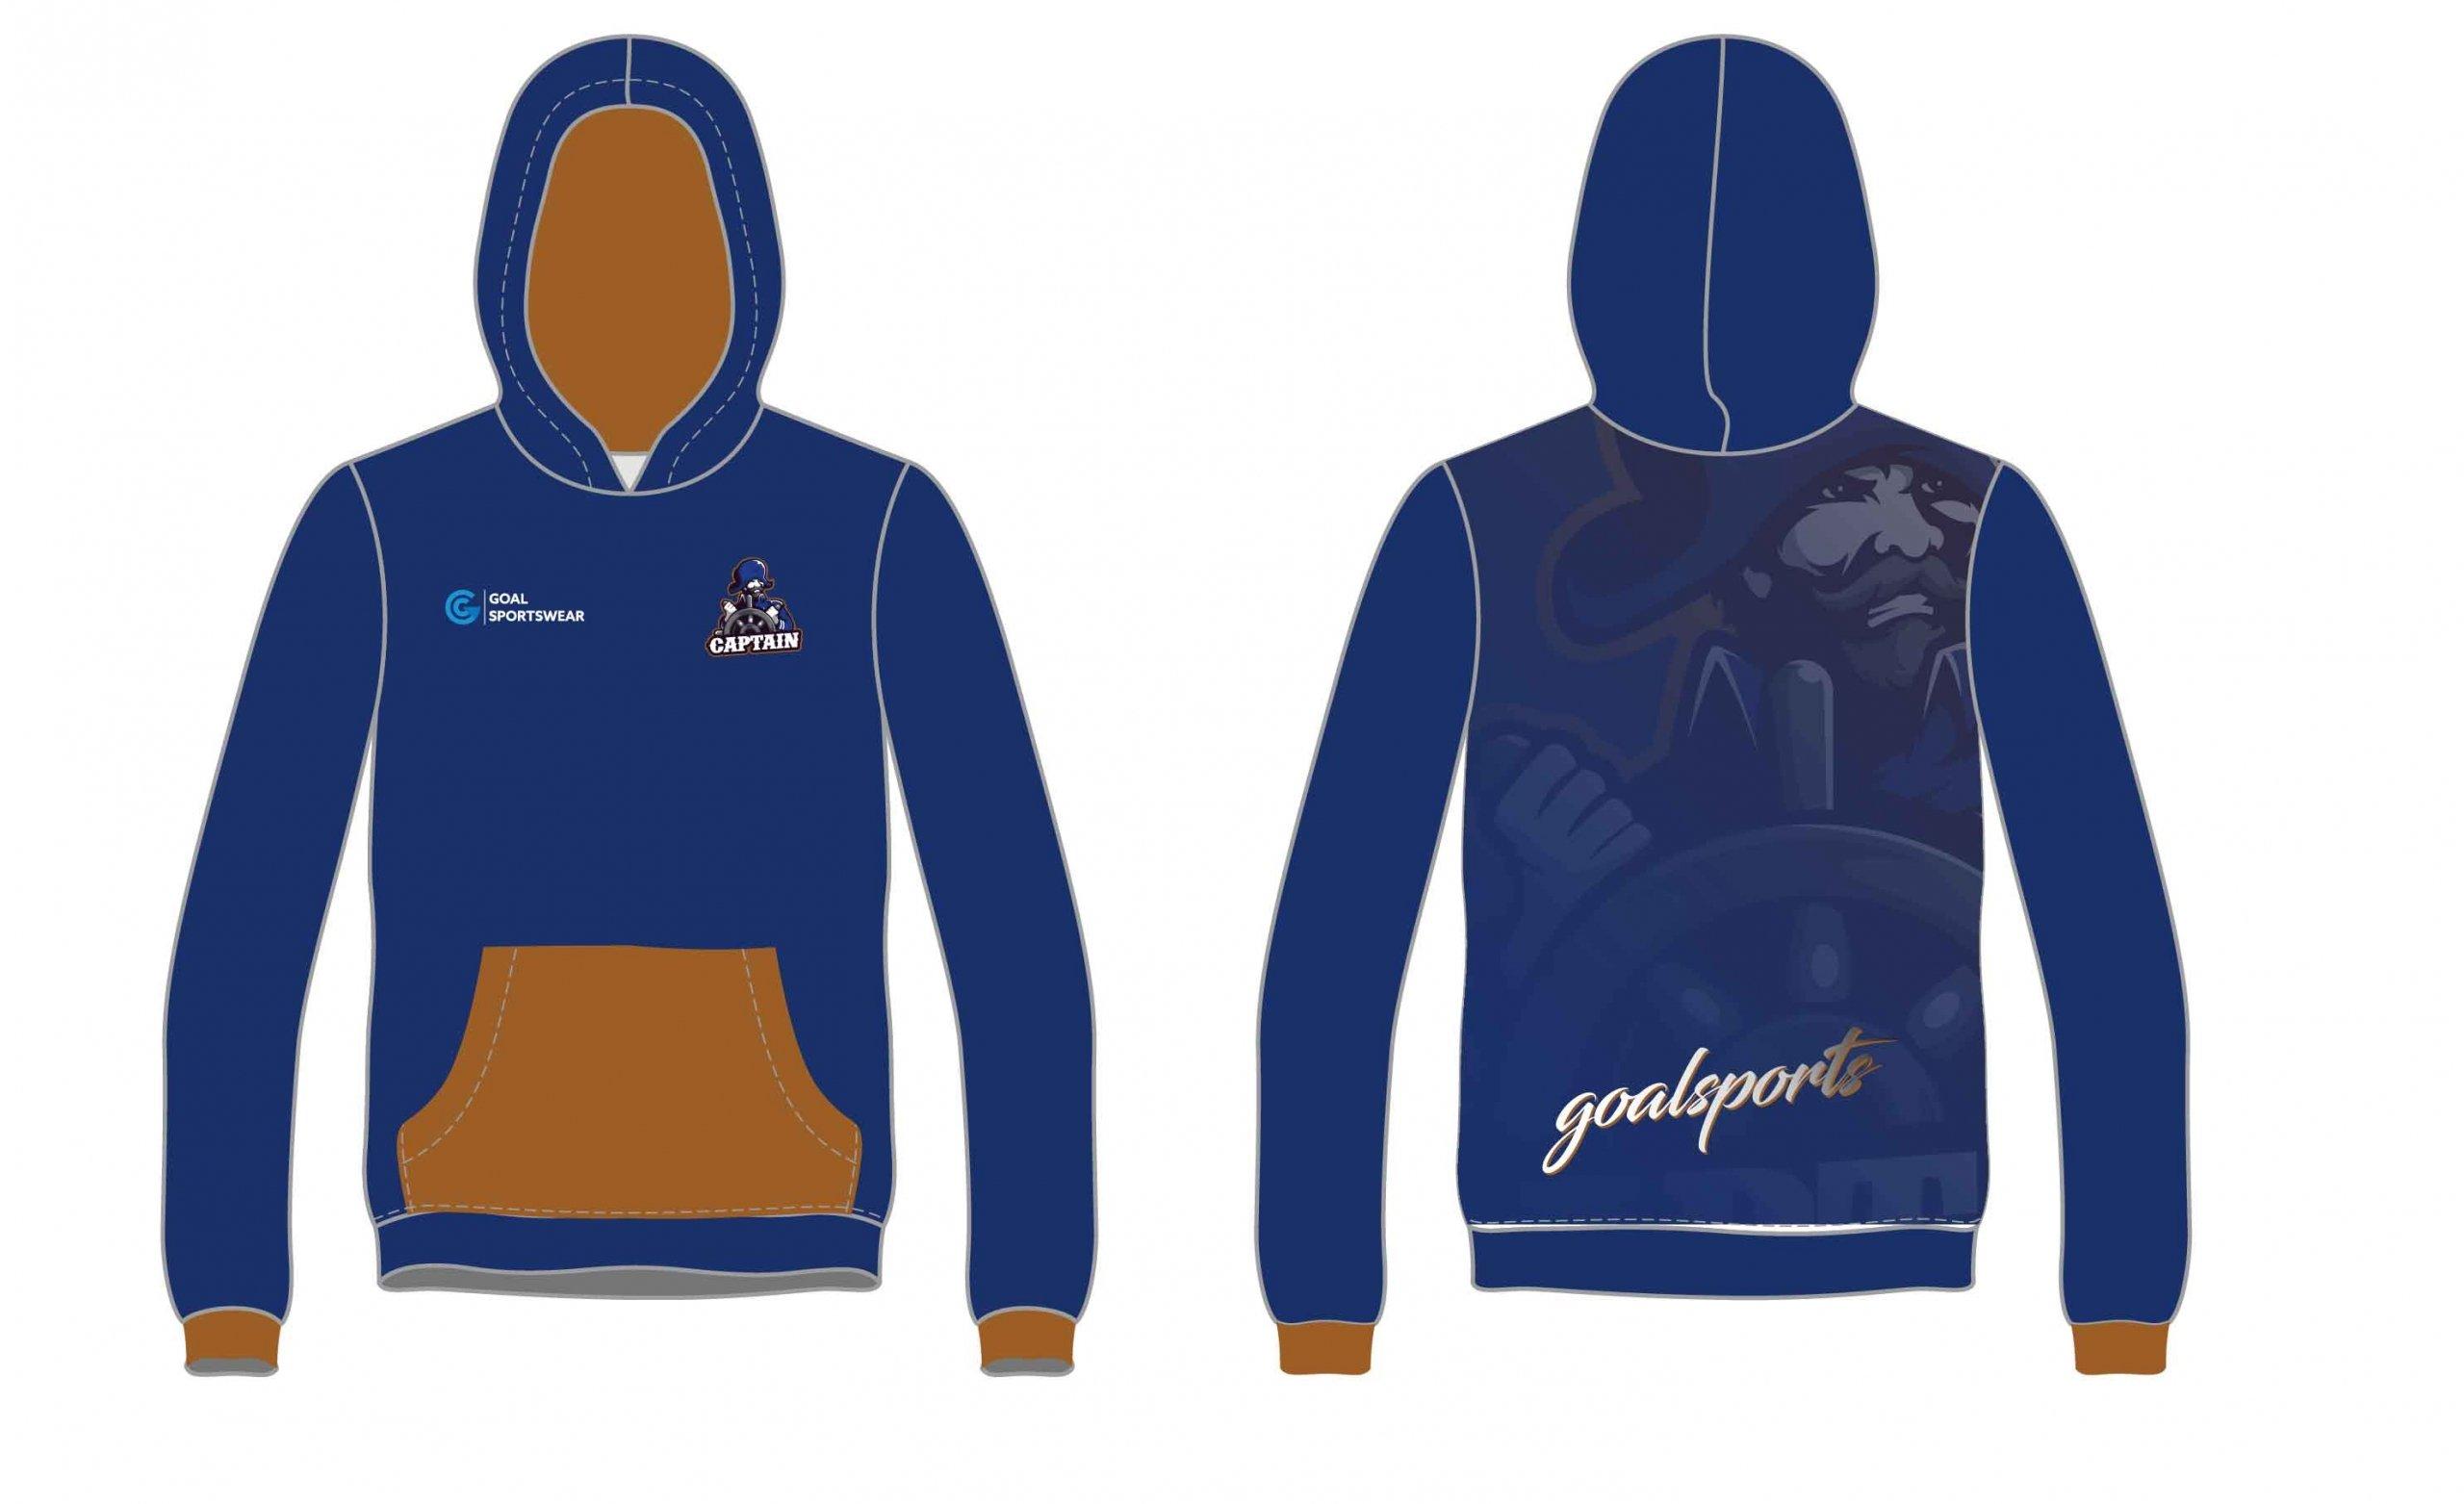 Full polyester breathable custom design sublimated wrestling hoodies